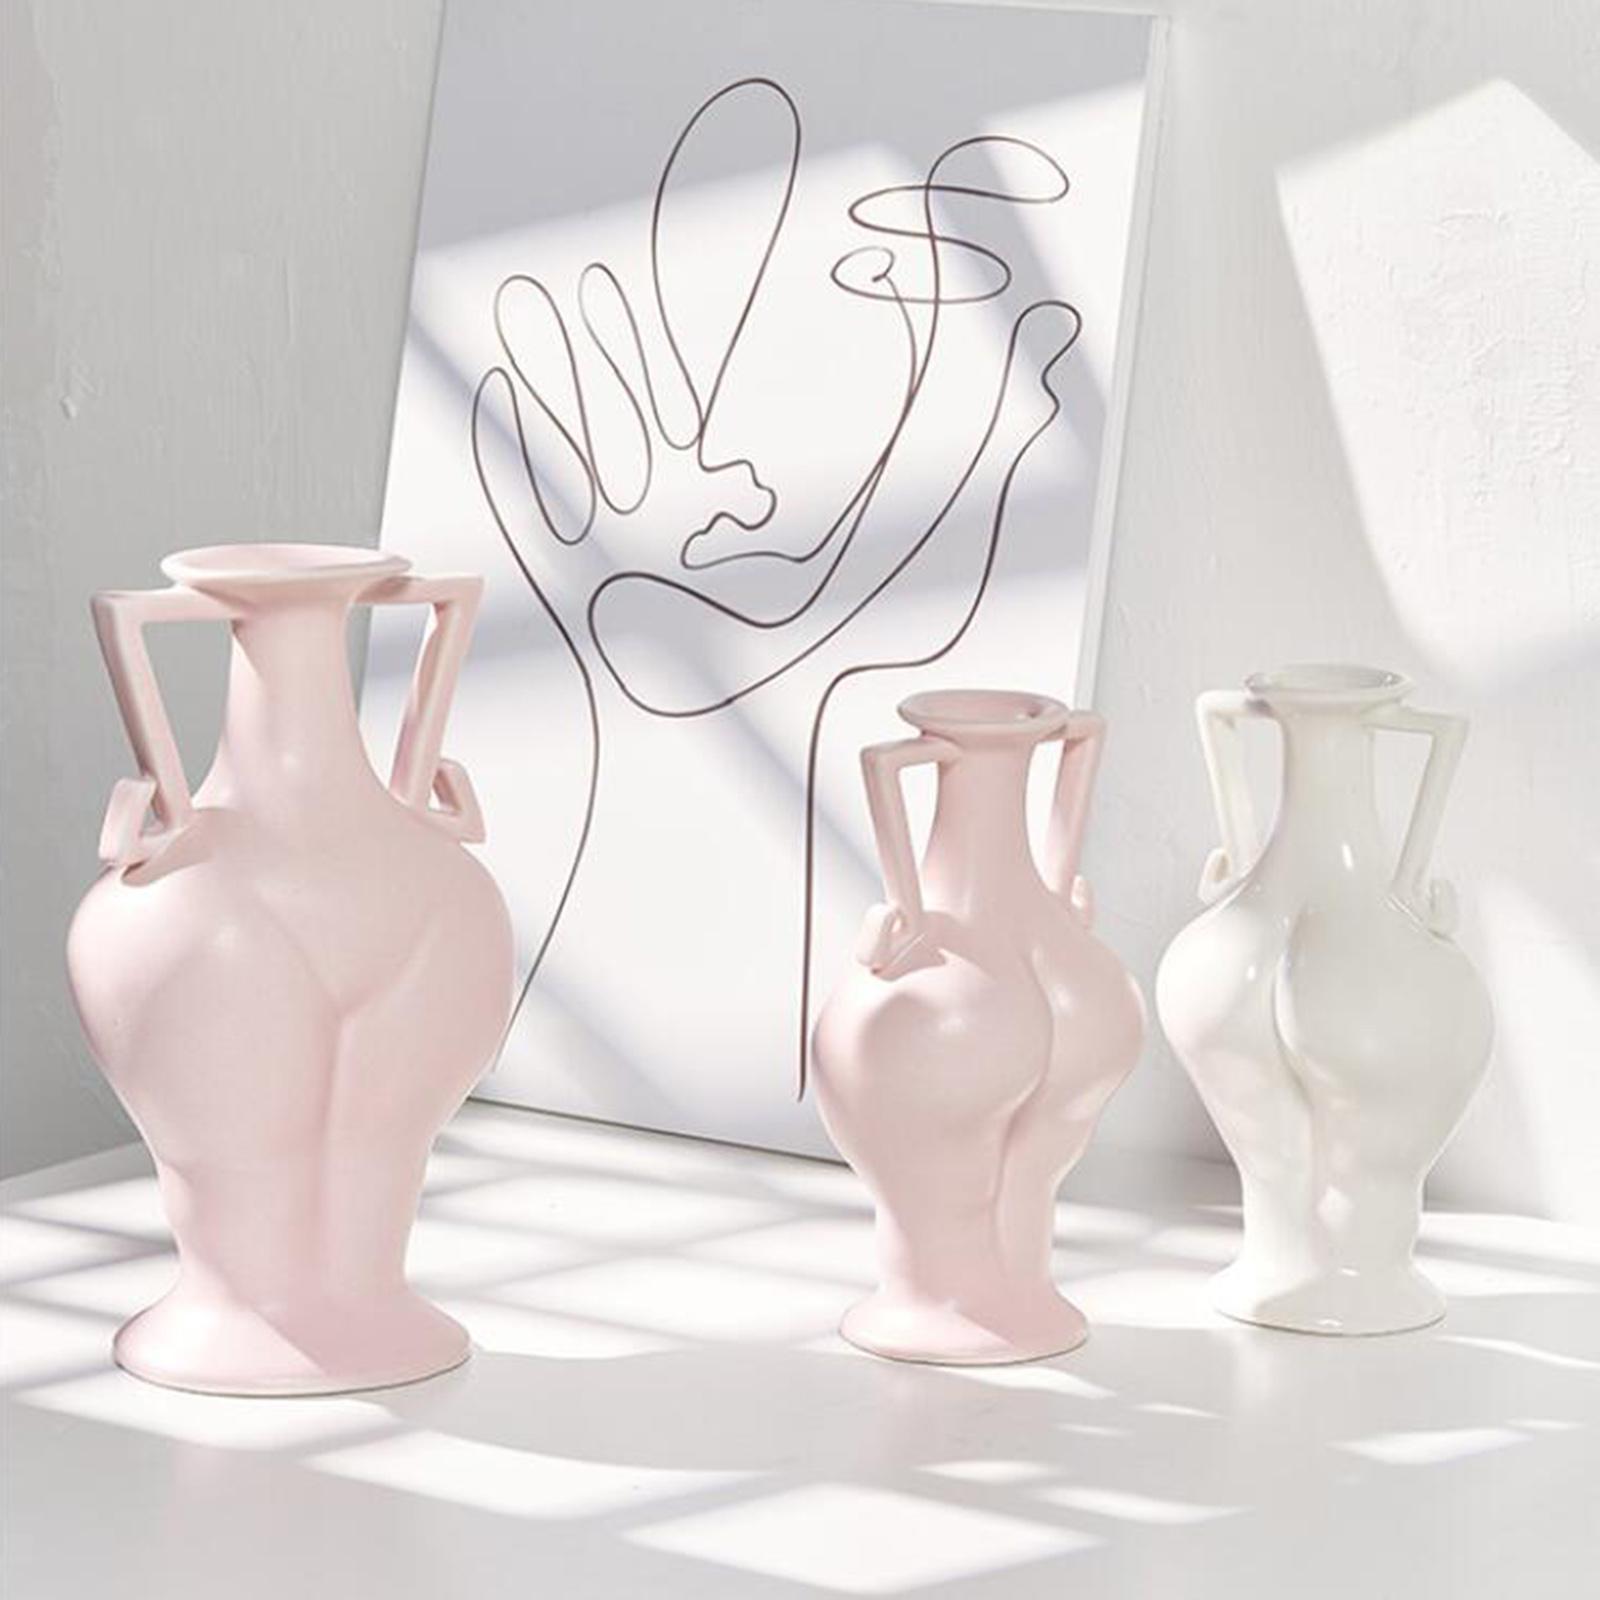 Indexbild 7 - Blumenvase Keramik Blumentöpfe Trockenblumenhalter Pflanzenvasen Wohnkultur